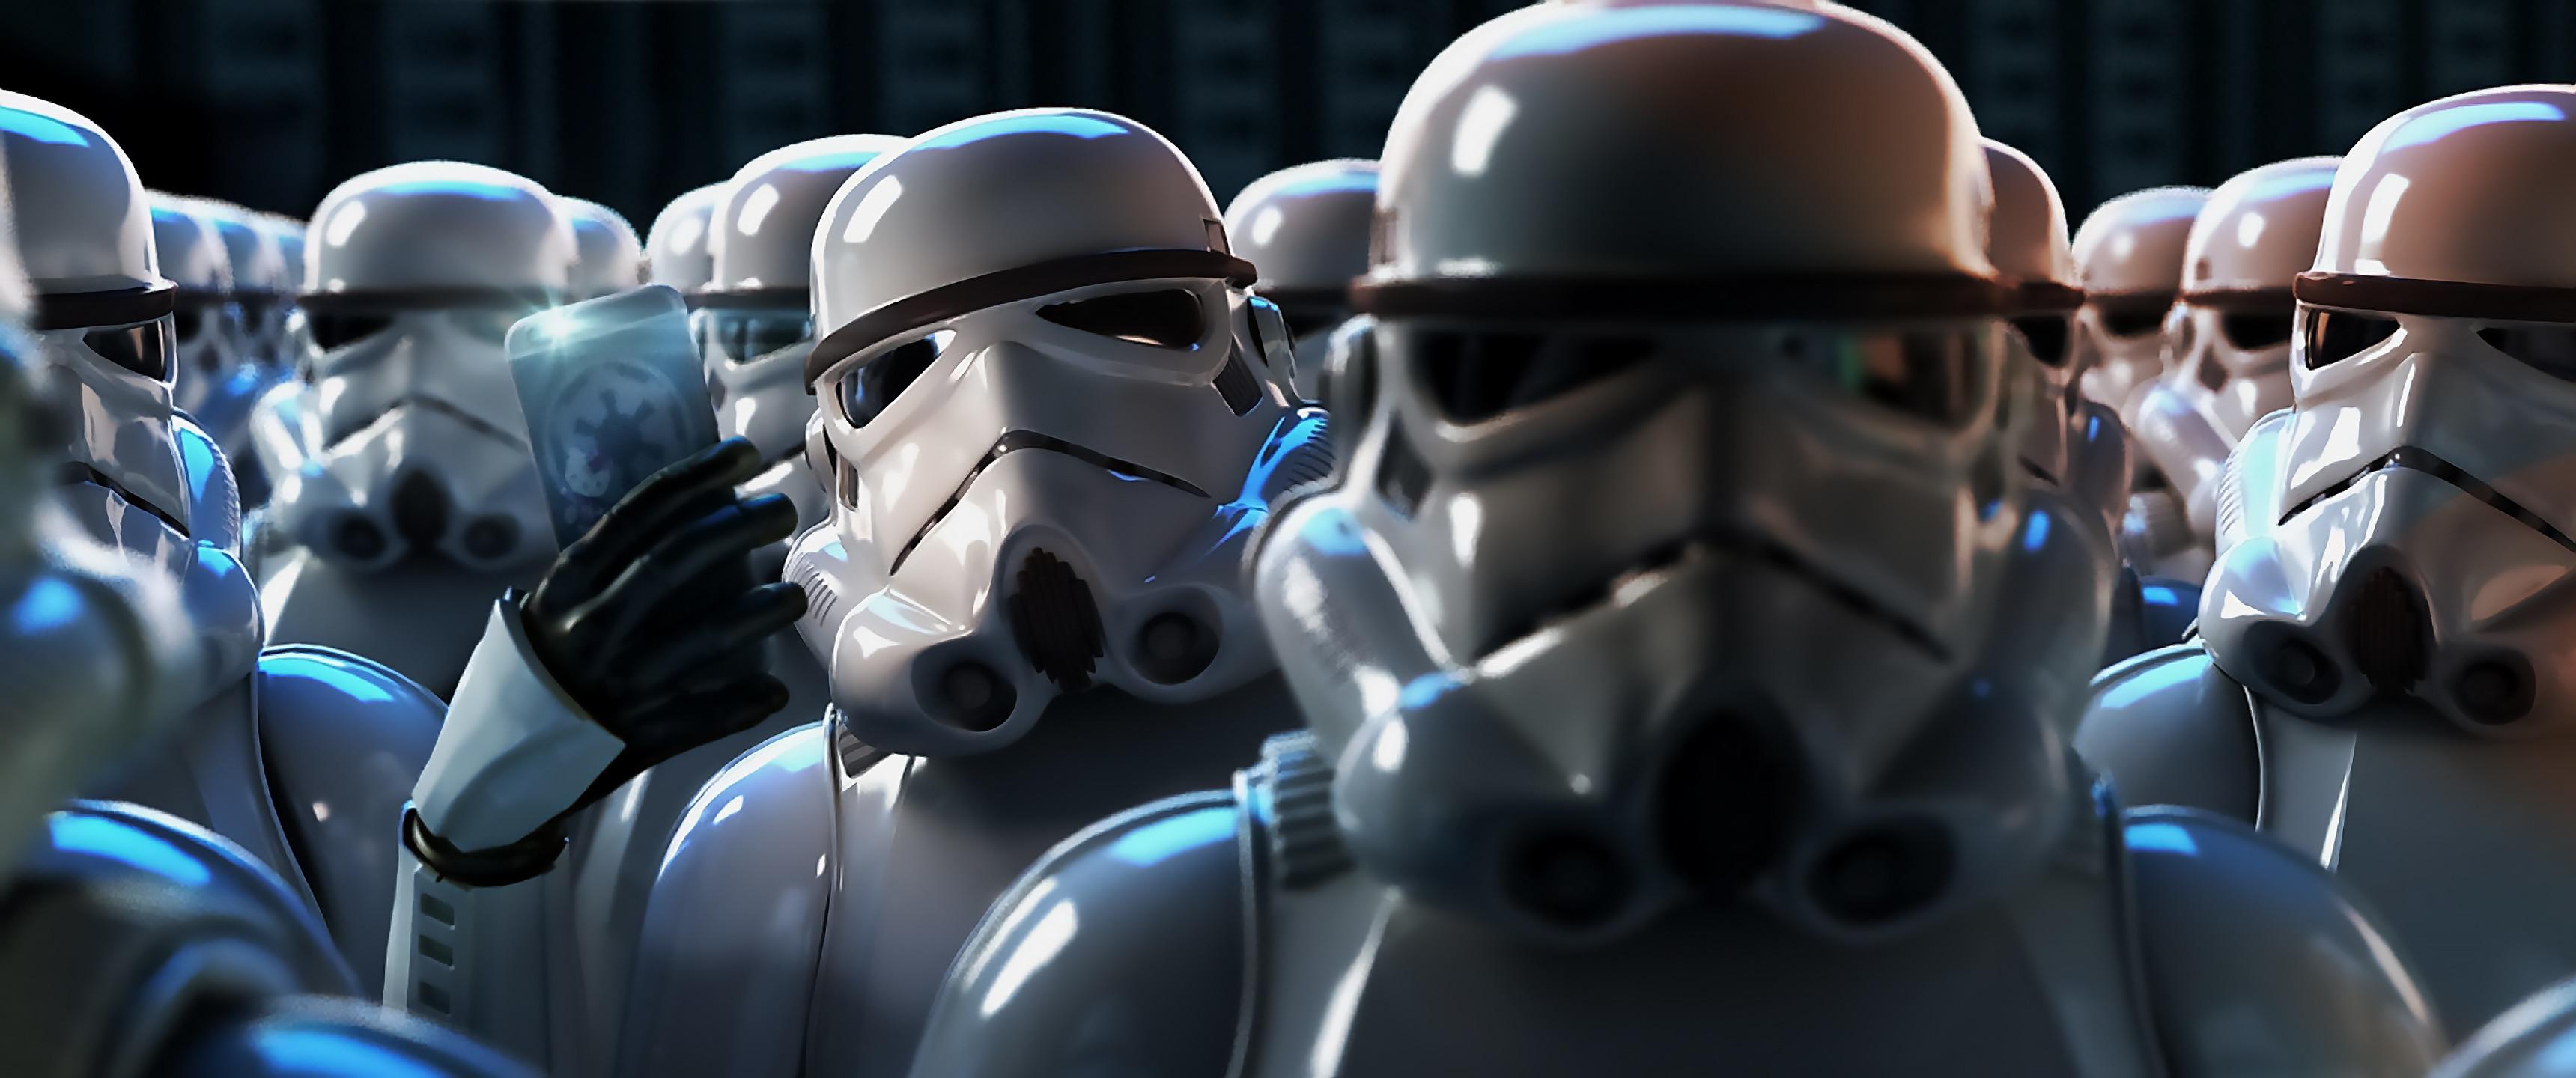 Star Wars – #OMGDarthVader [3440×1440] …